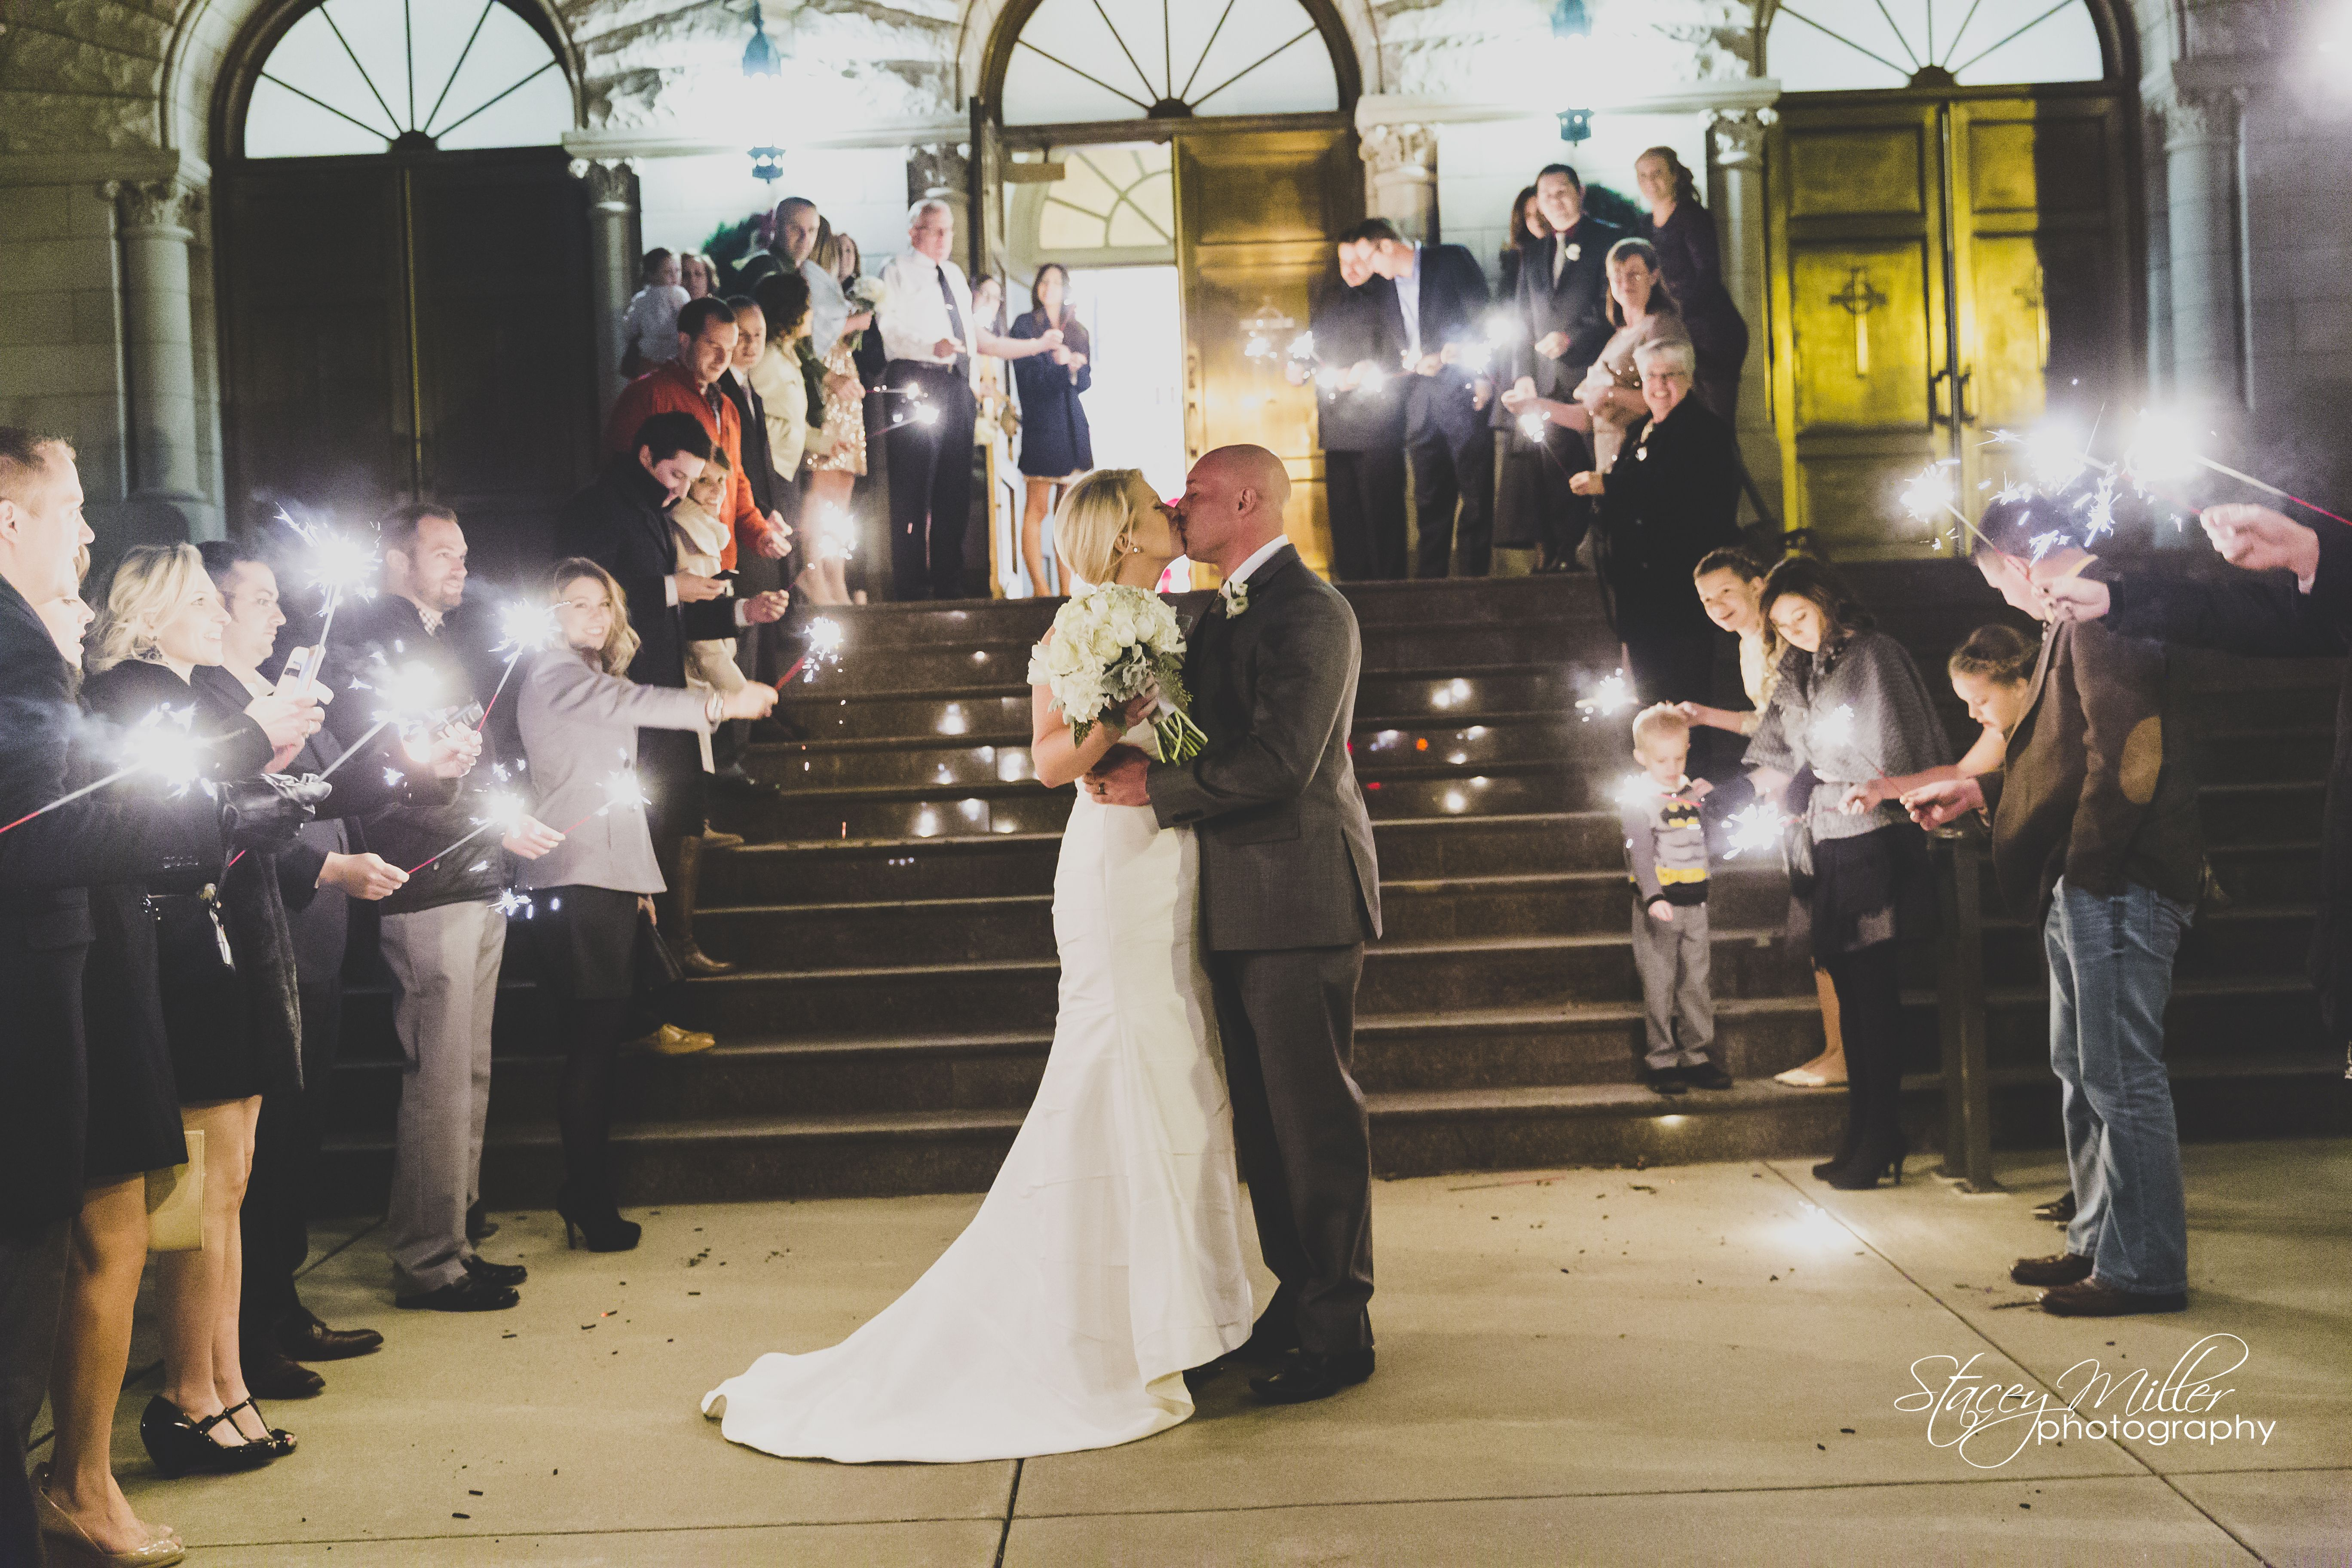 Grand Rapids Michigan Wedding Photographer Stacey Miller Photography Via The My Bridal Pix